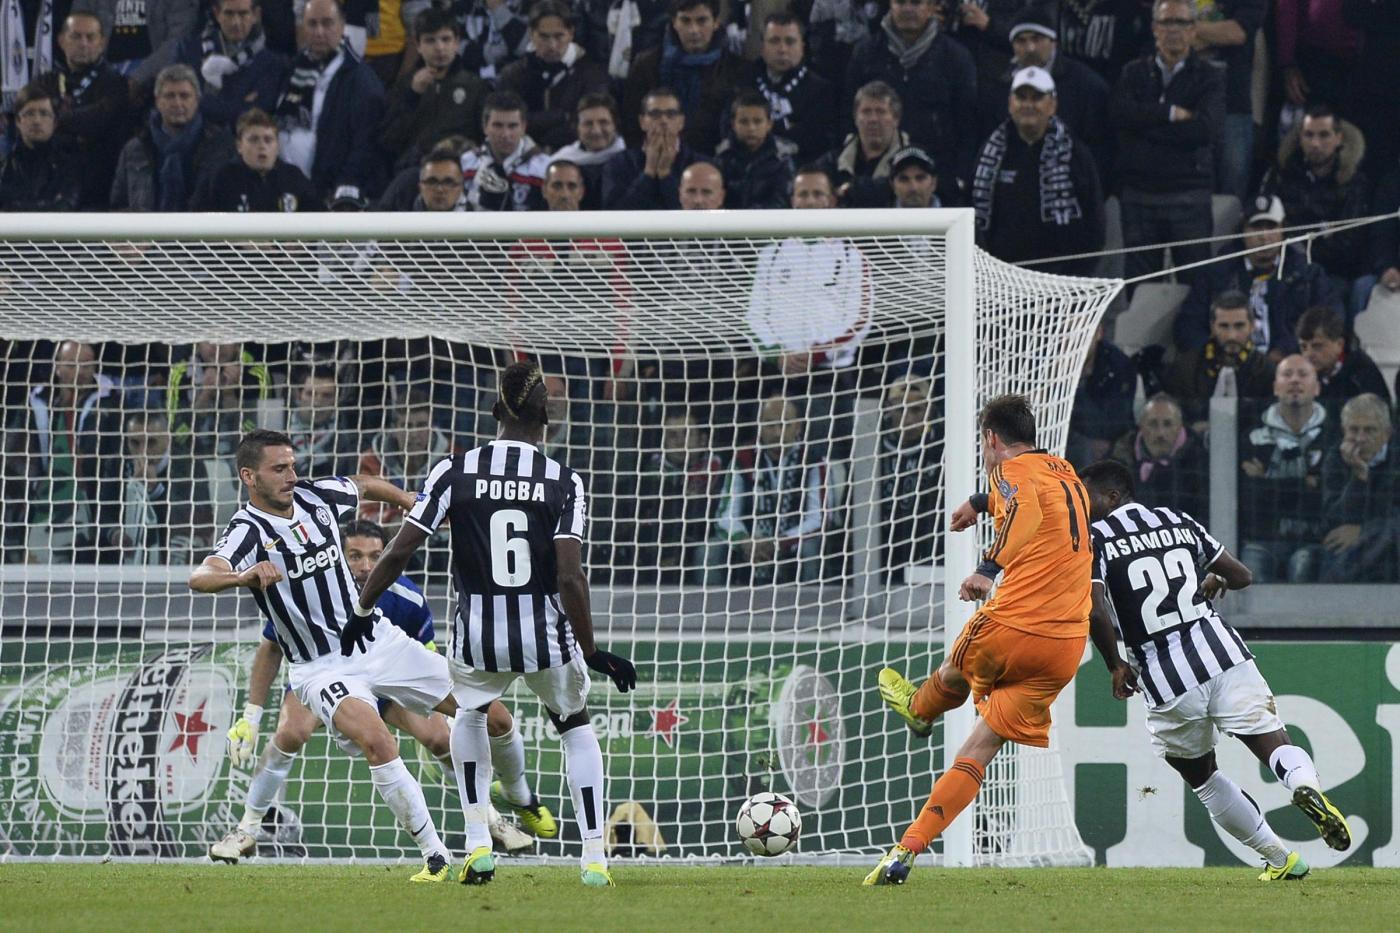 Juventus quinta in Europa per media gol/partita, Real domina la classifica